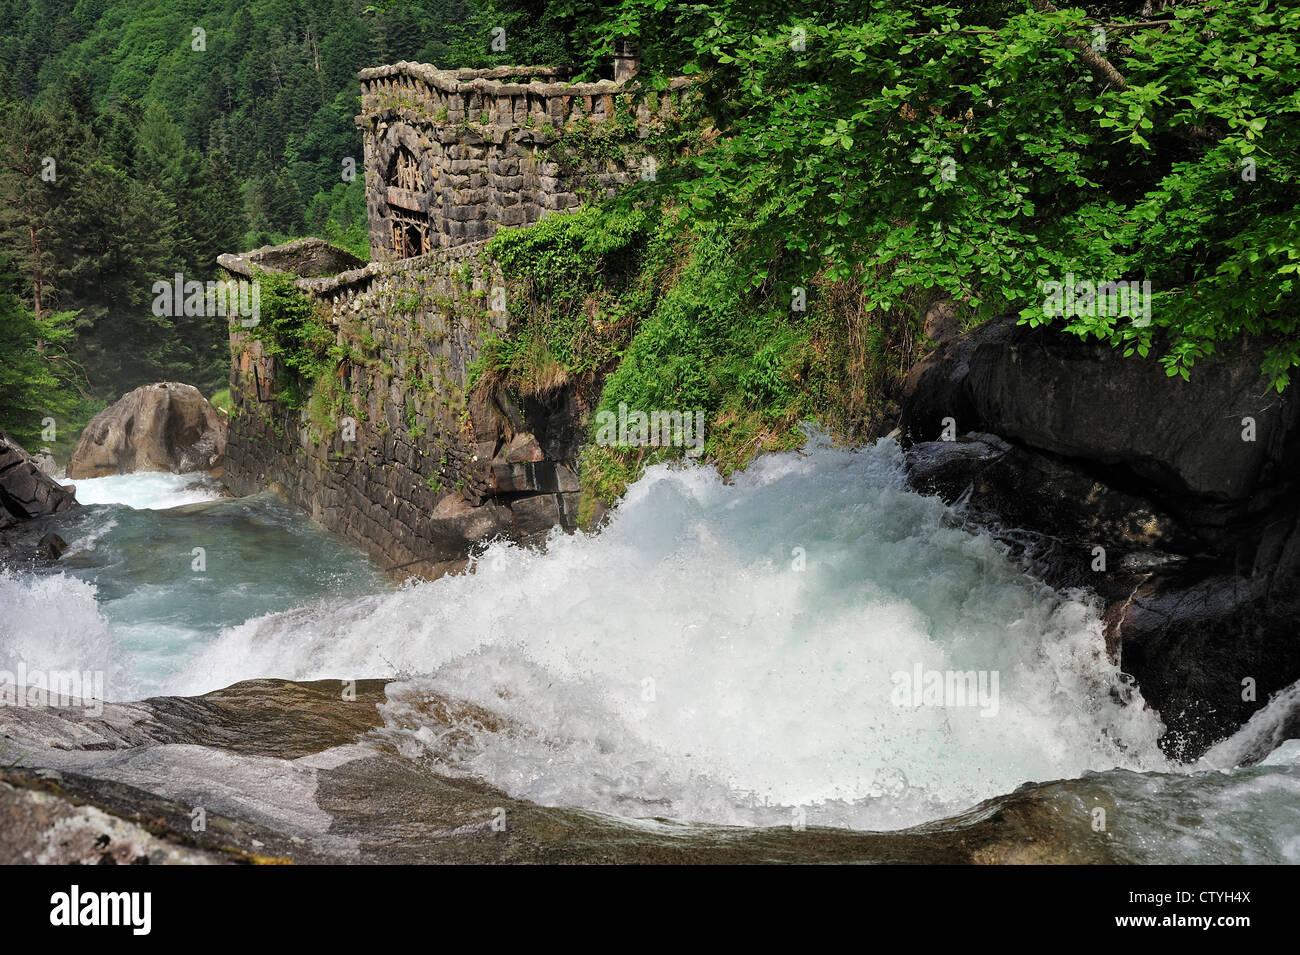 Cascata del Gave de Jéret nel Hautes-Pyrénées vicino a Cauterets, Pirenei, Francia Immagini Stock